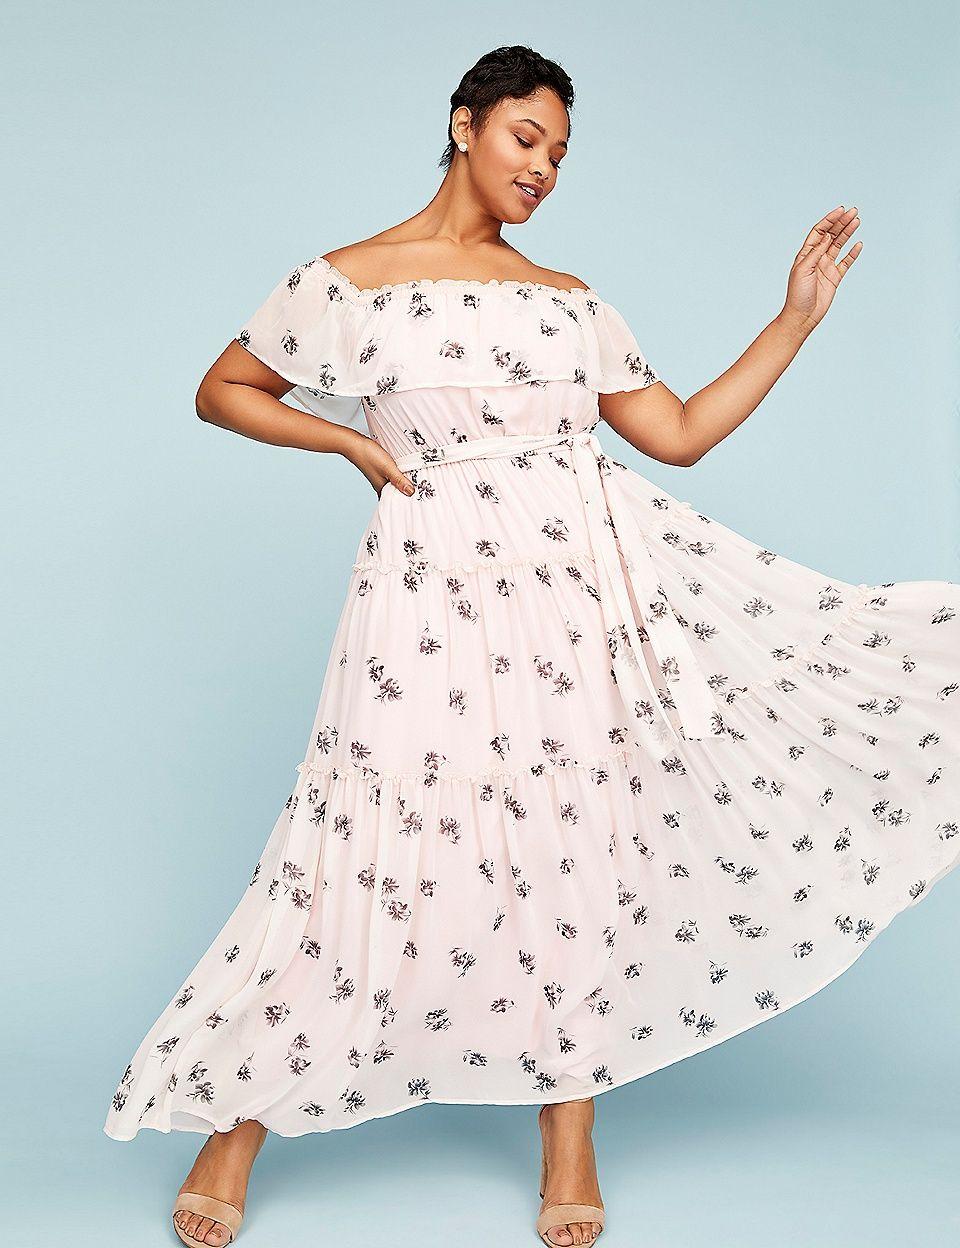 e7d1eb6cb589 Off-the-Shoulder Ruffle Maxi Dress | Lane Bryant - Plus Size Fashion for  Women - Ad